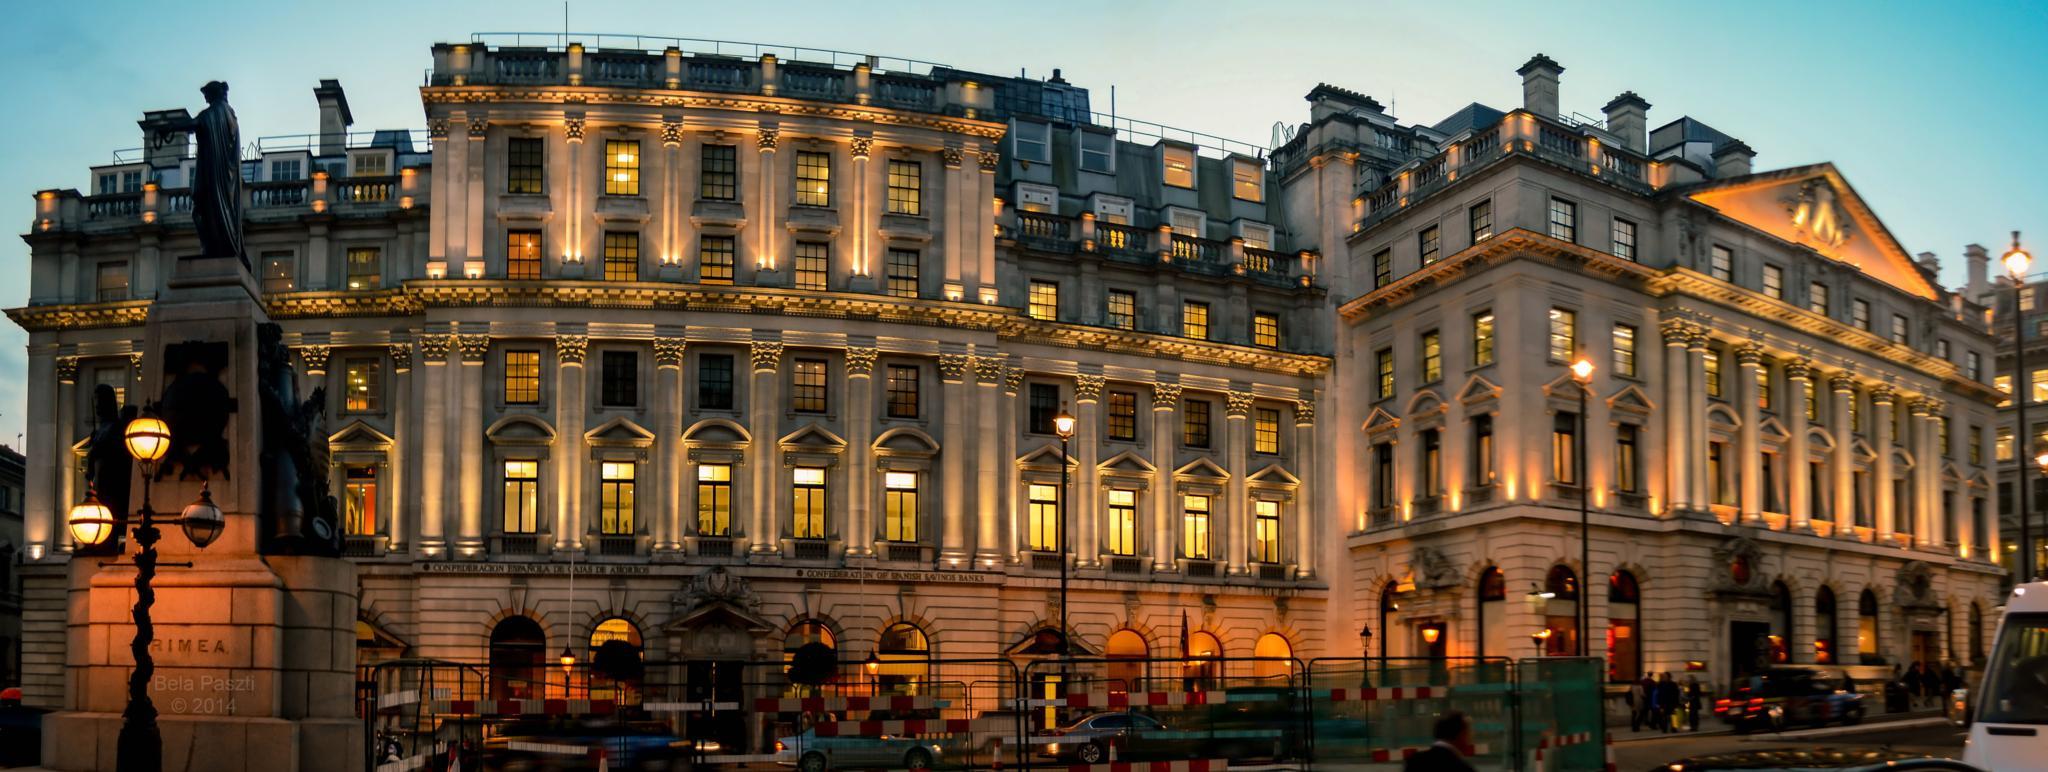 Photo in Architecture #london #street #light